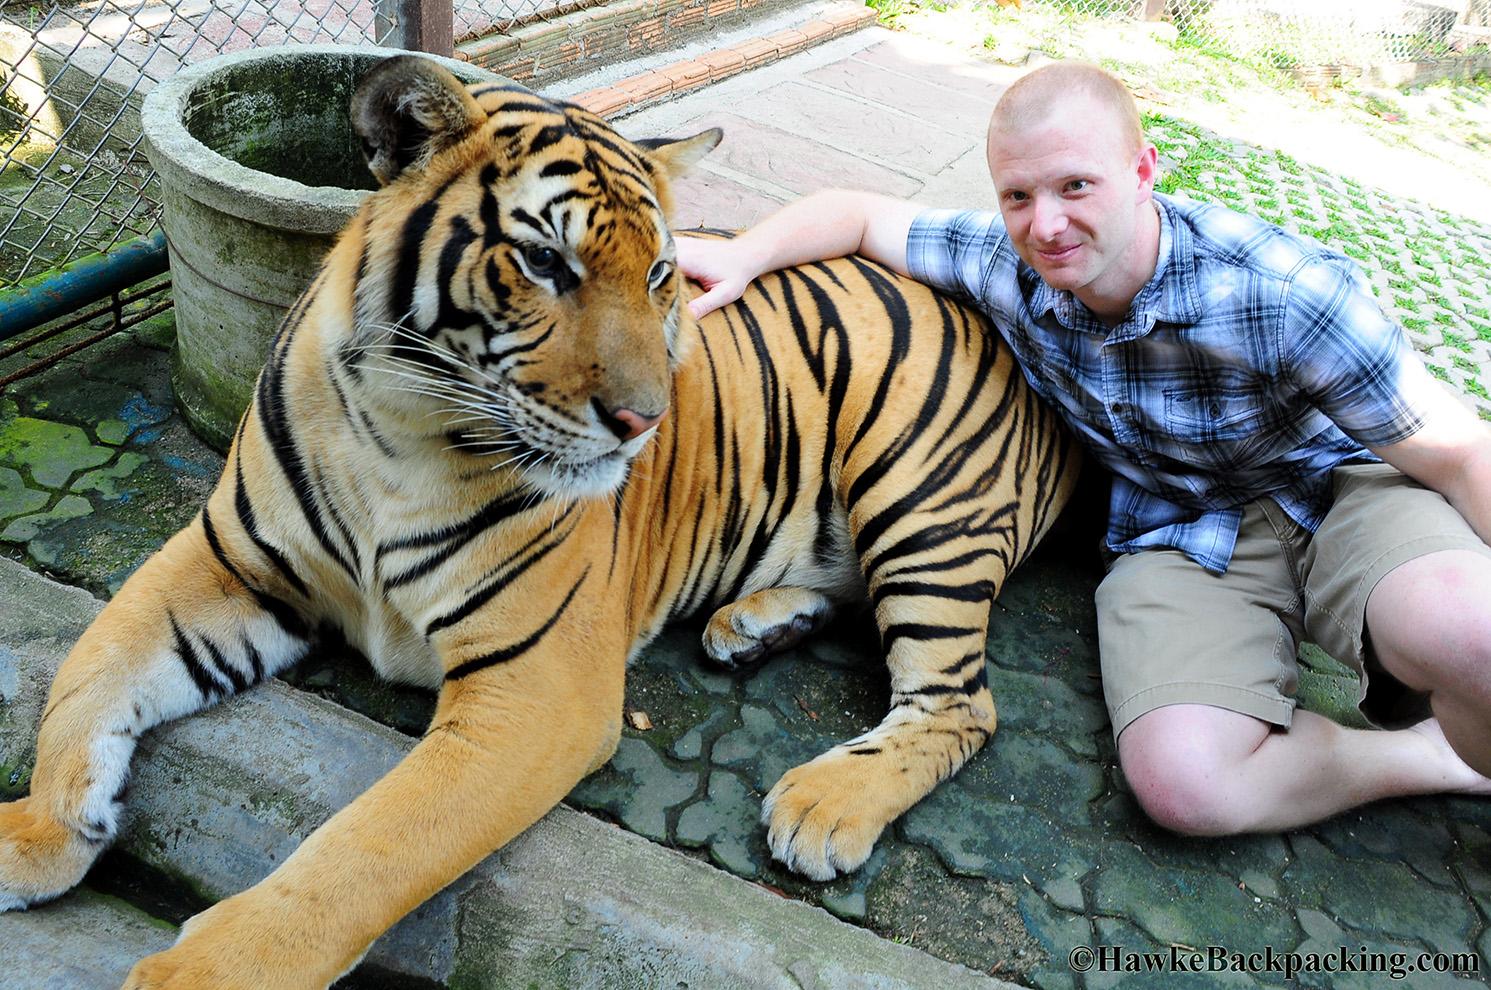 Tiger Kingdom - HawkeBackpacking.com